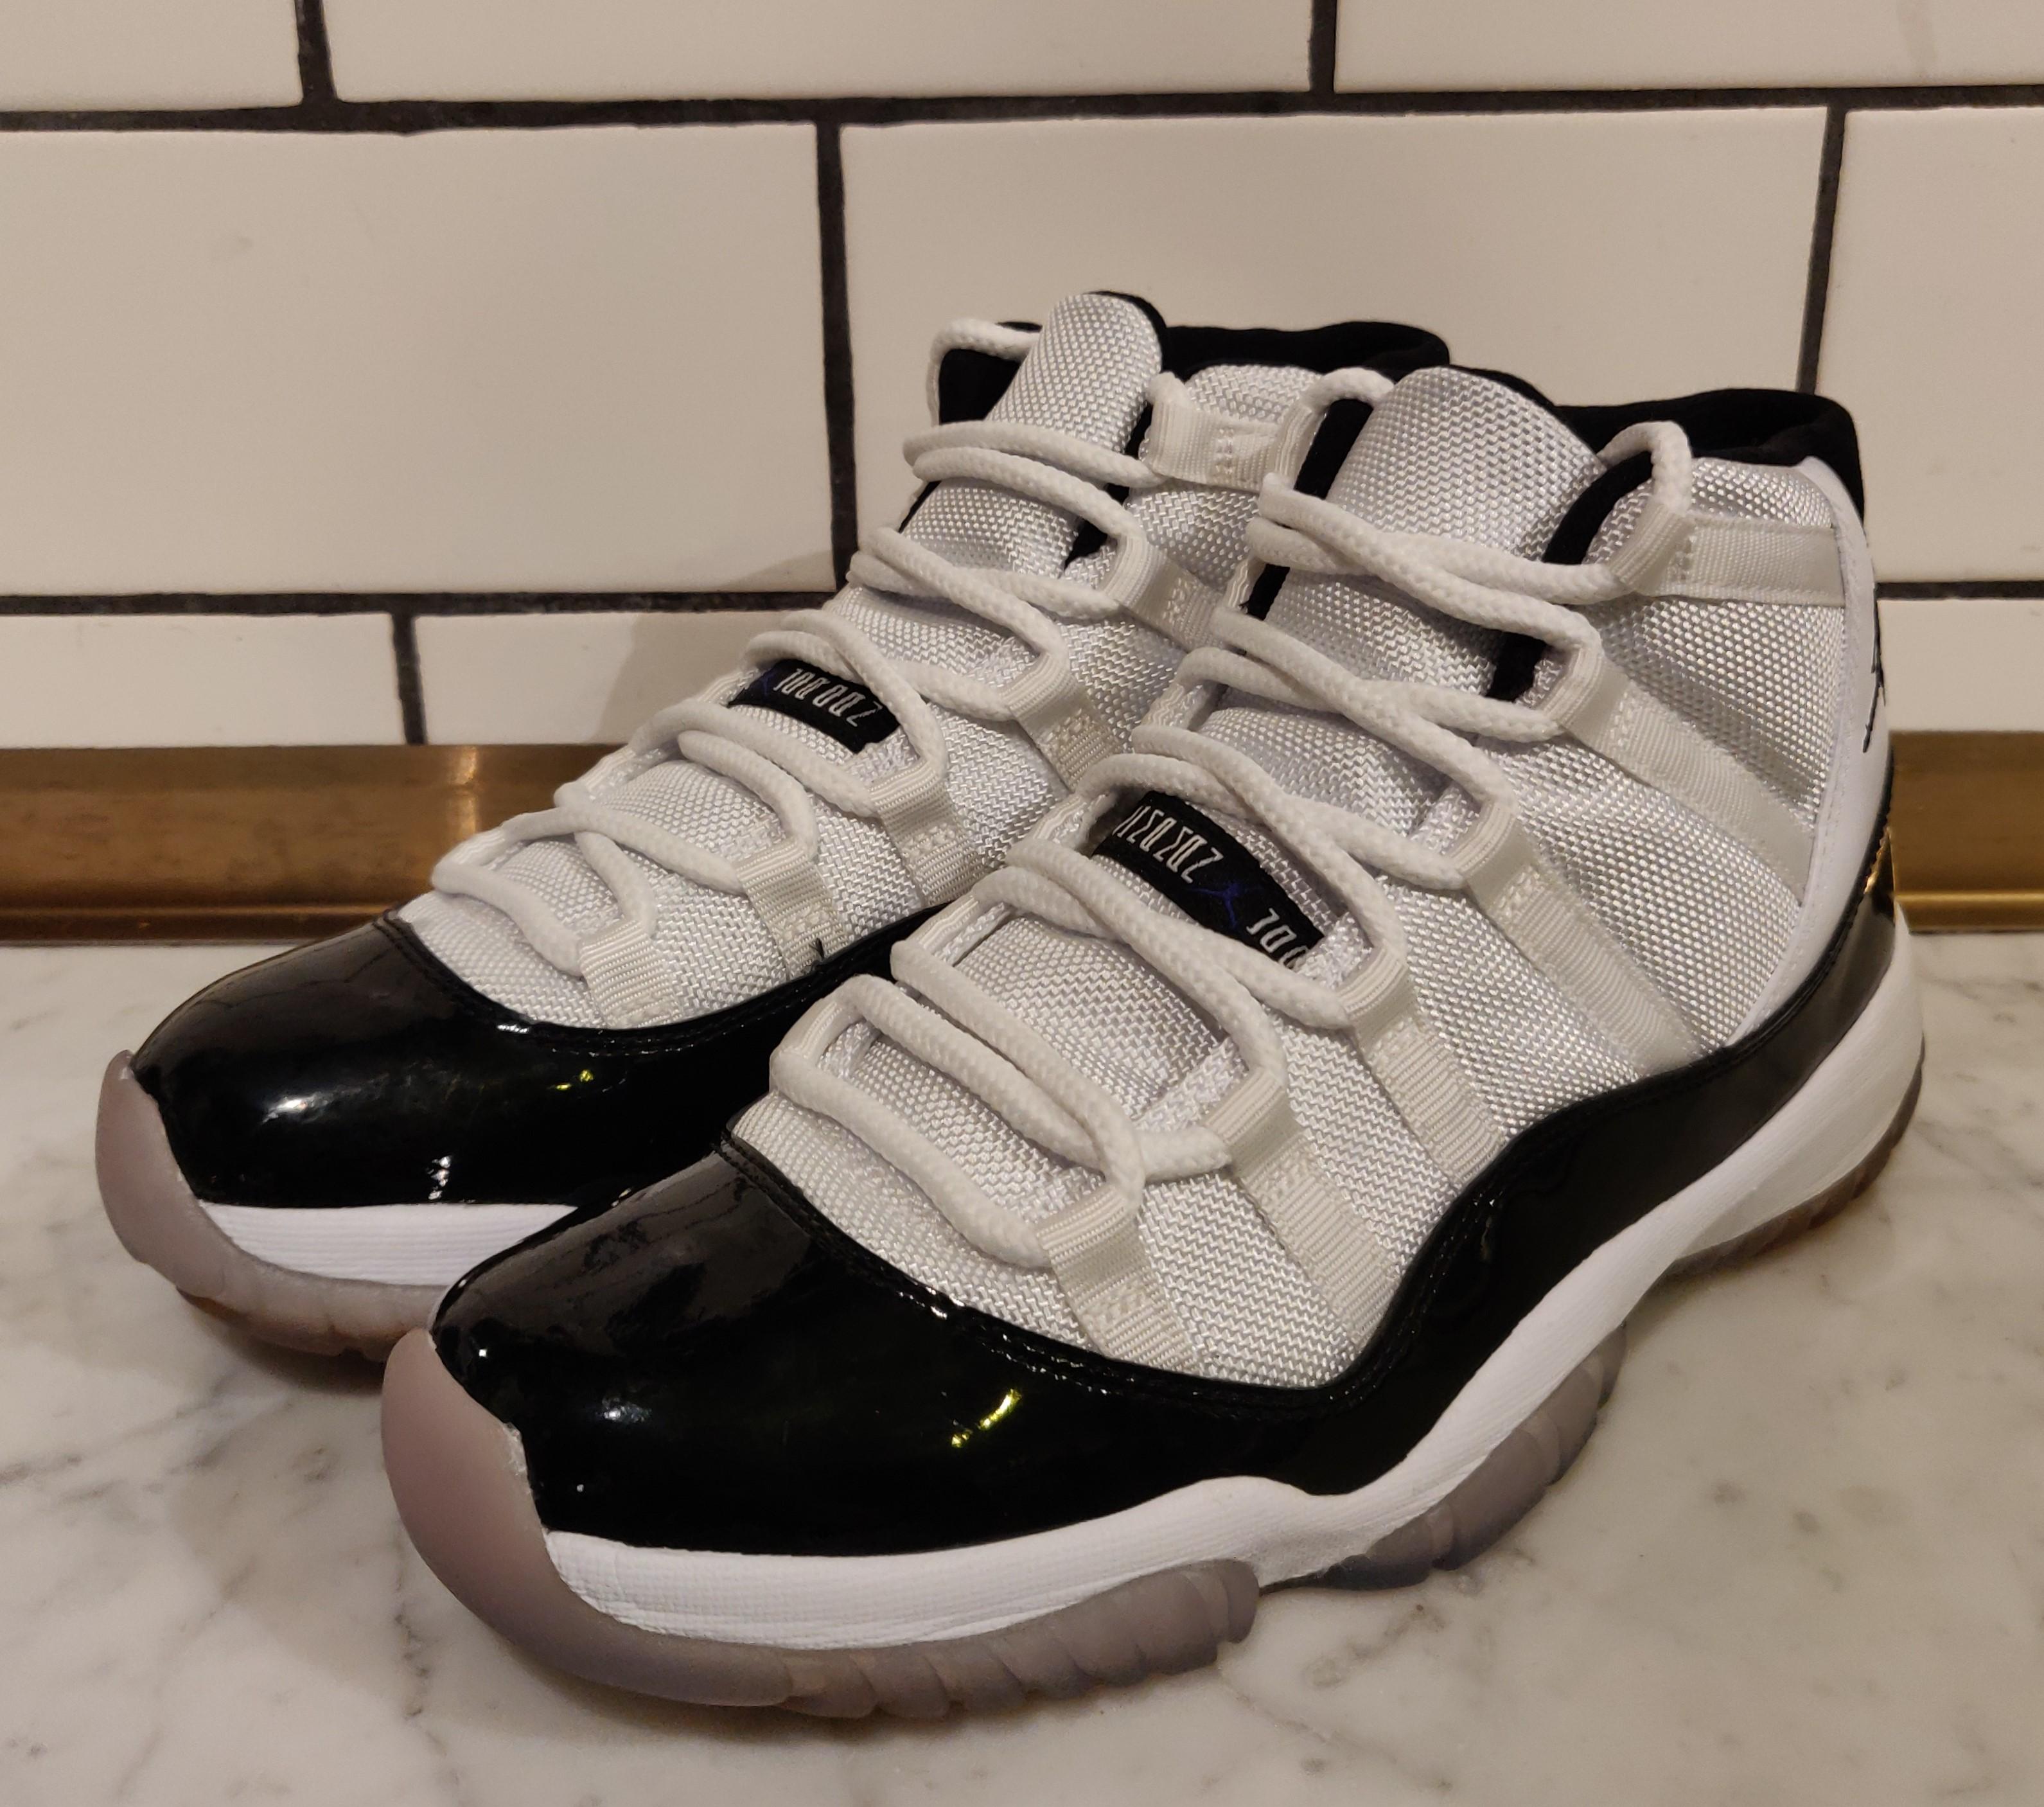 Jordan 11 concord (2011)